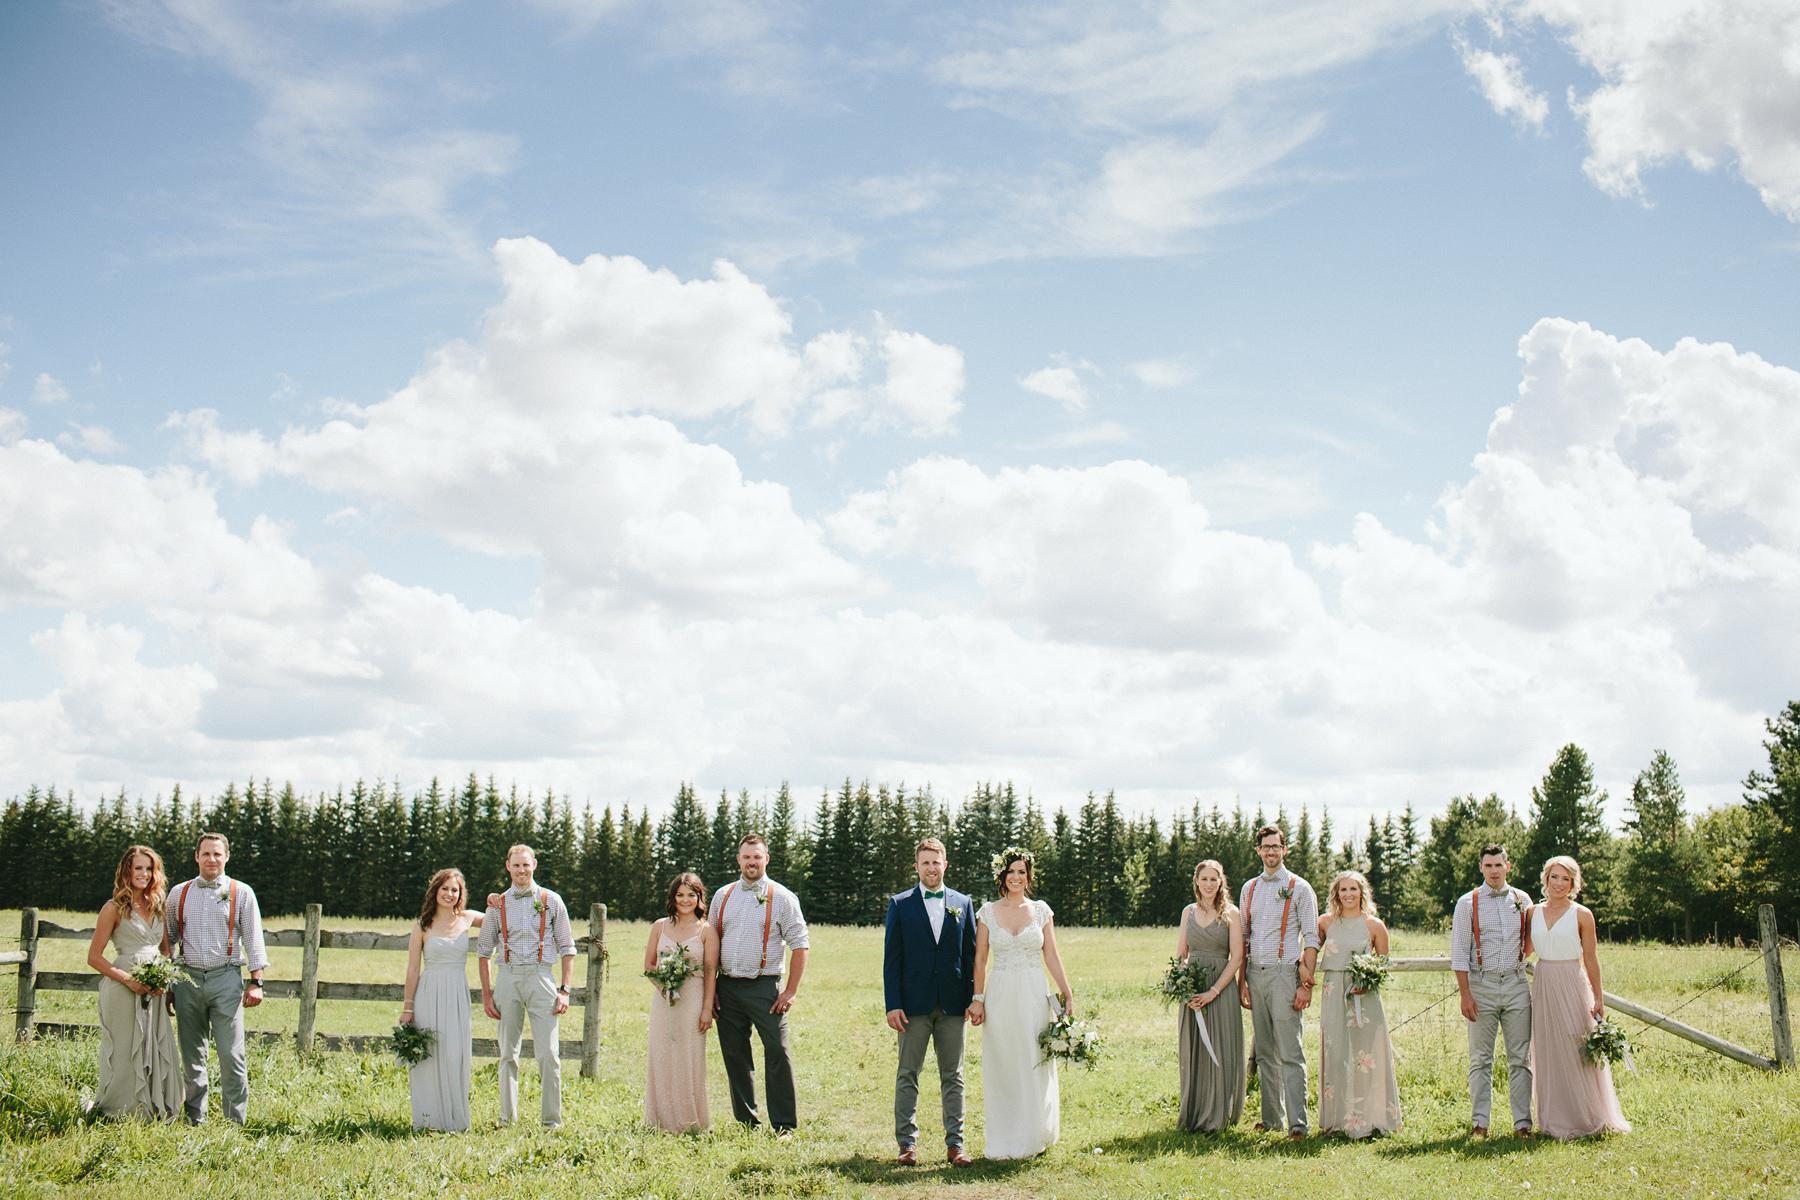 alberta-farm-wedding-photographer-rp-wj-069.jpg